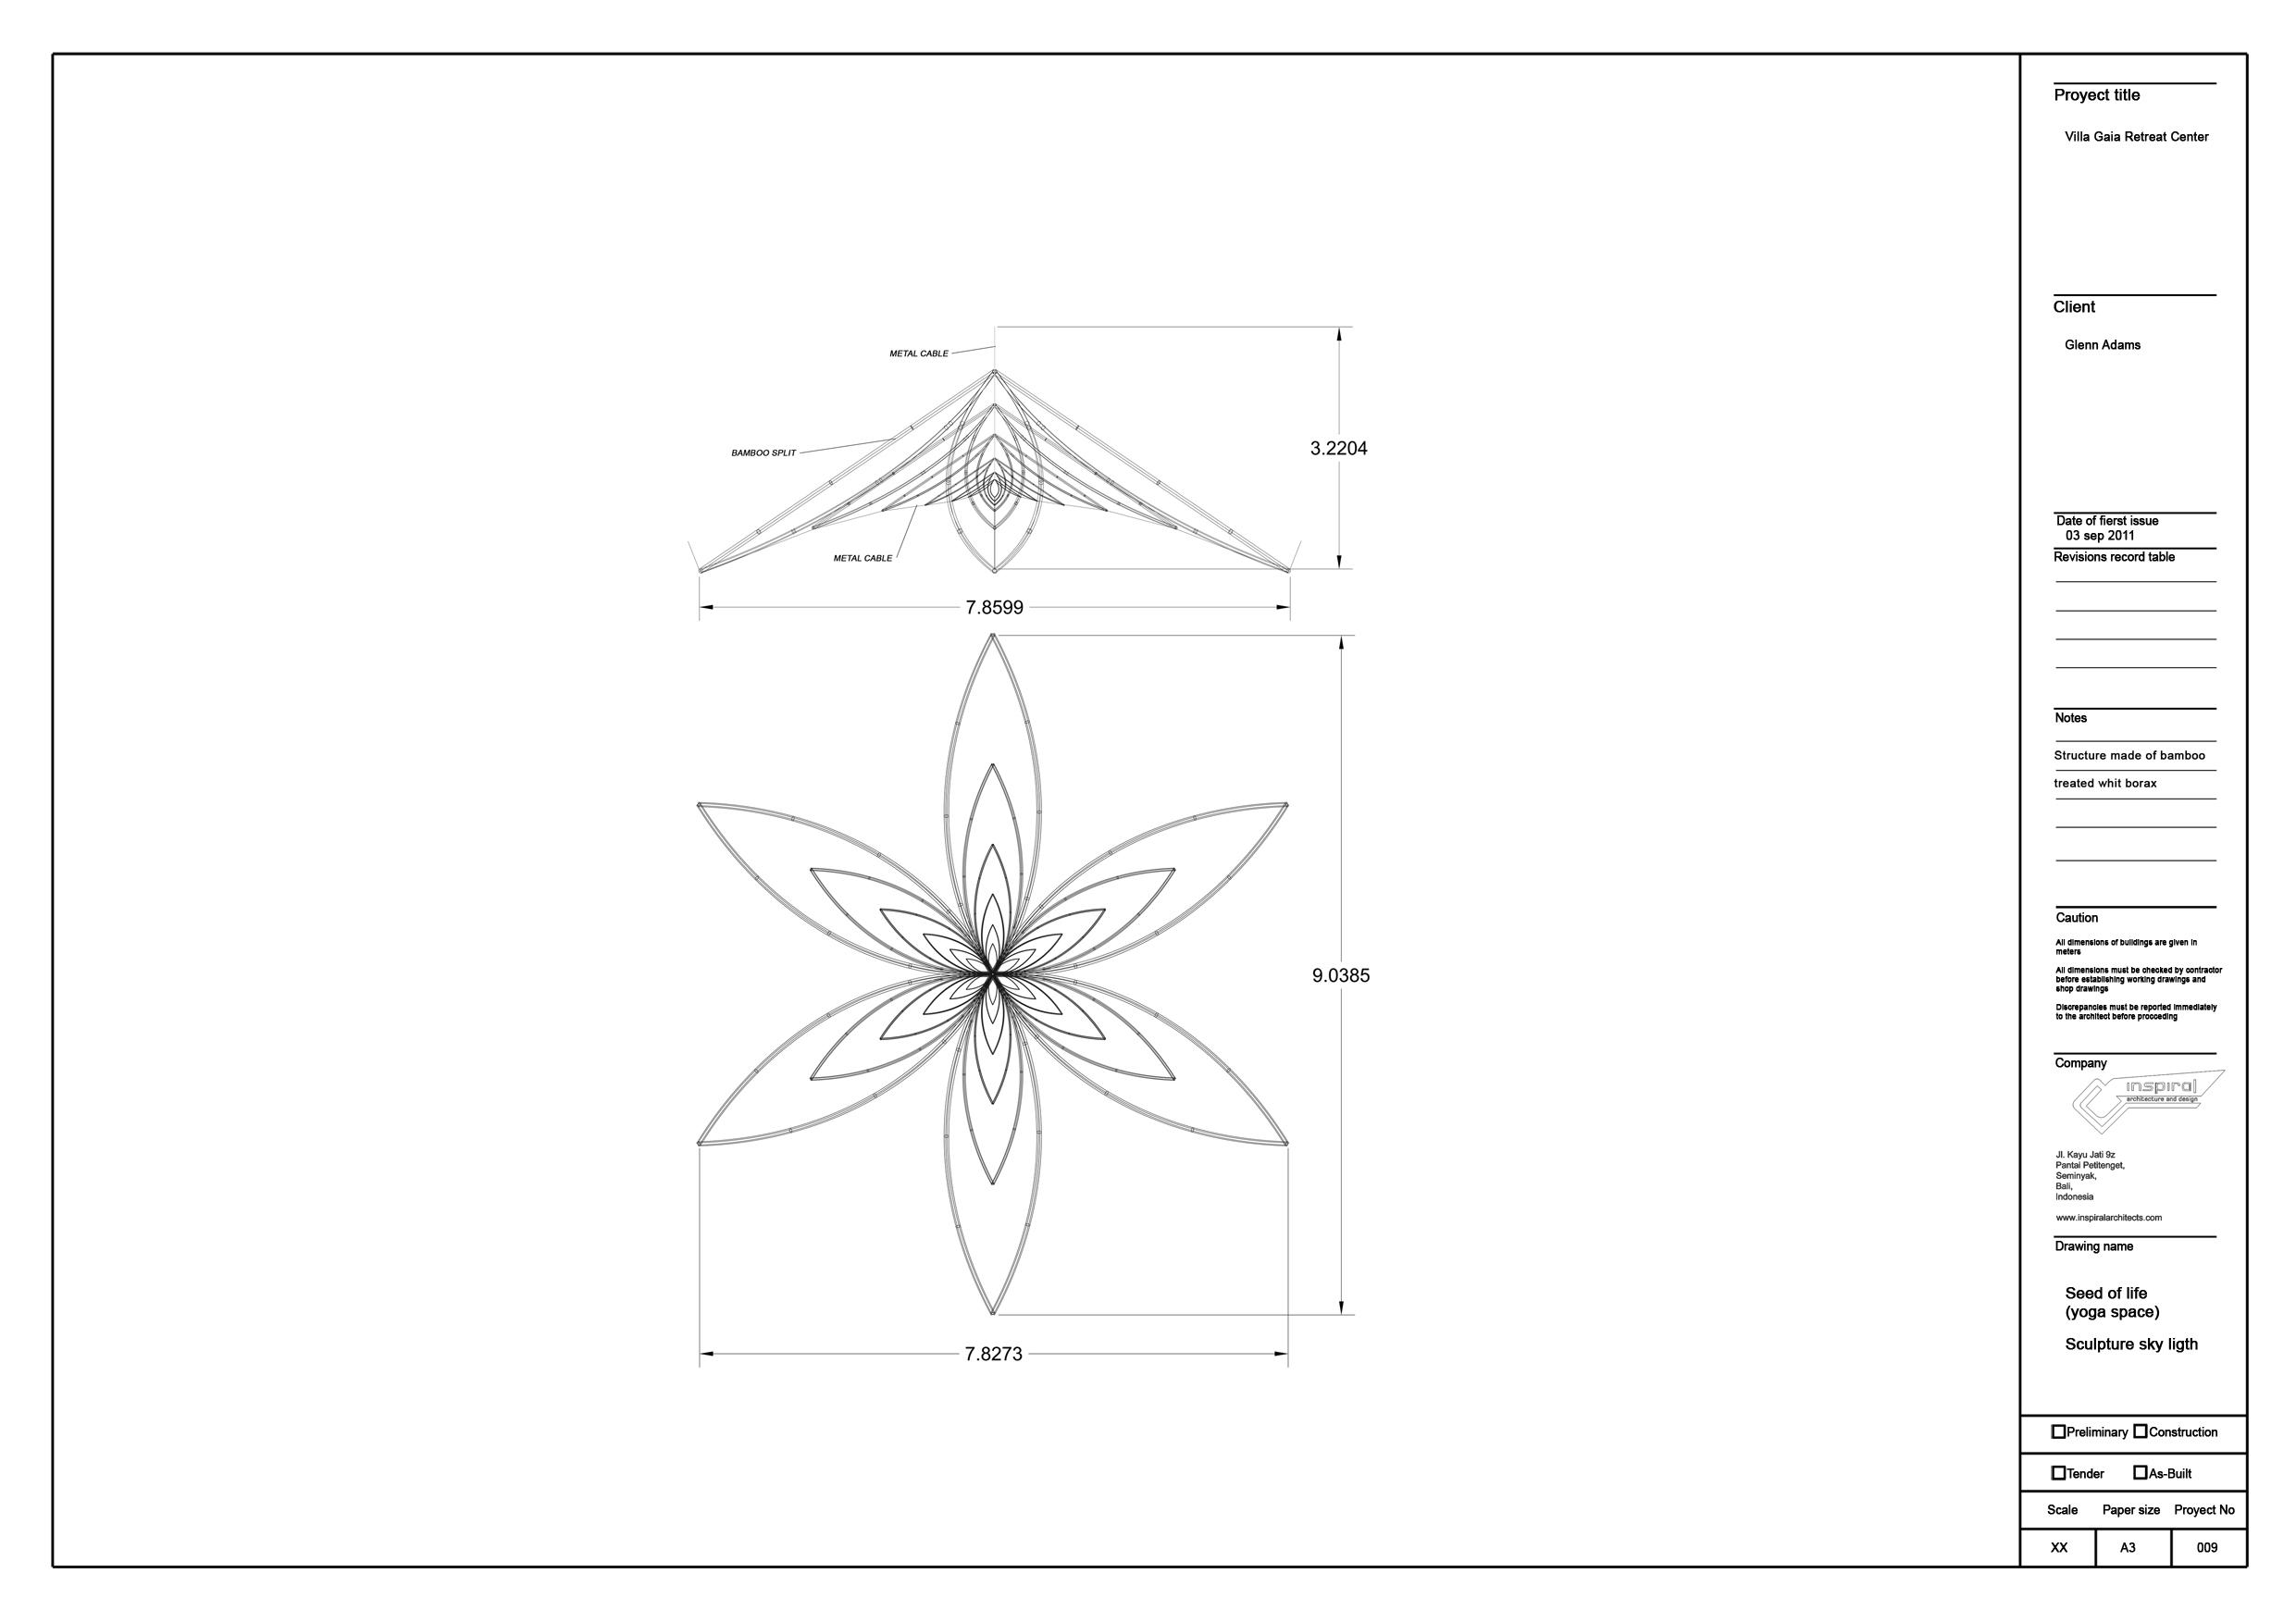 13 seed of life (yoga space) sculpture sky ligth copia.jpg